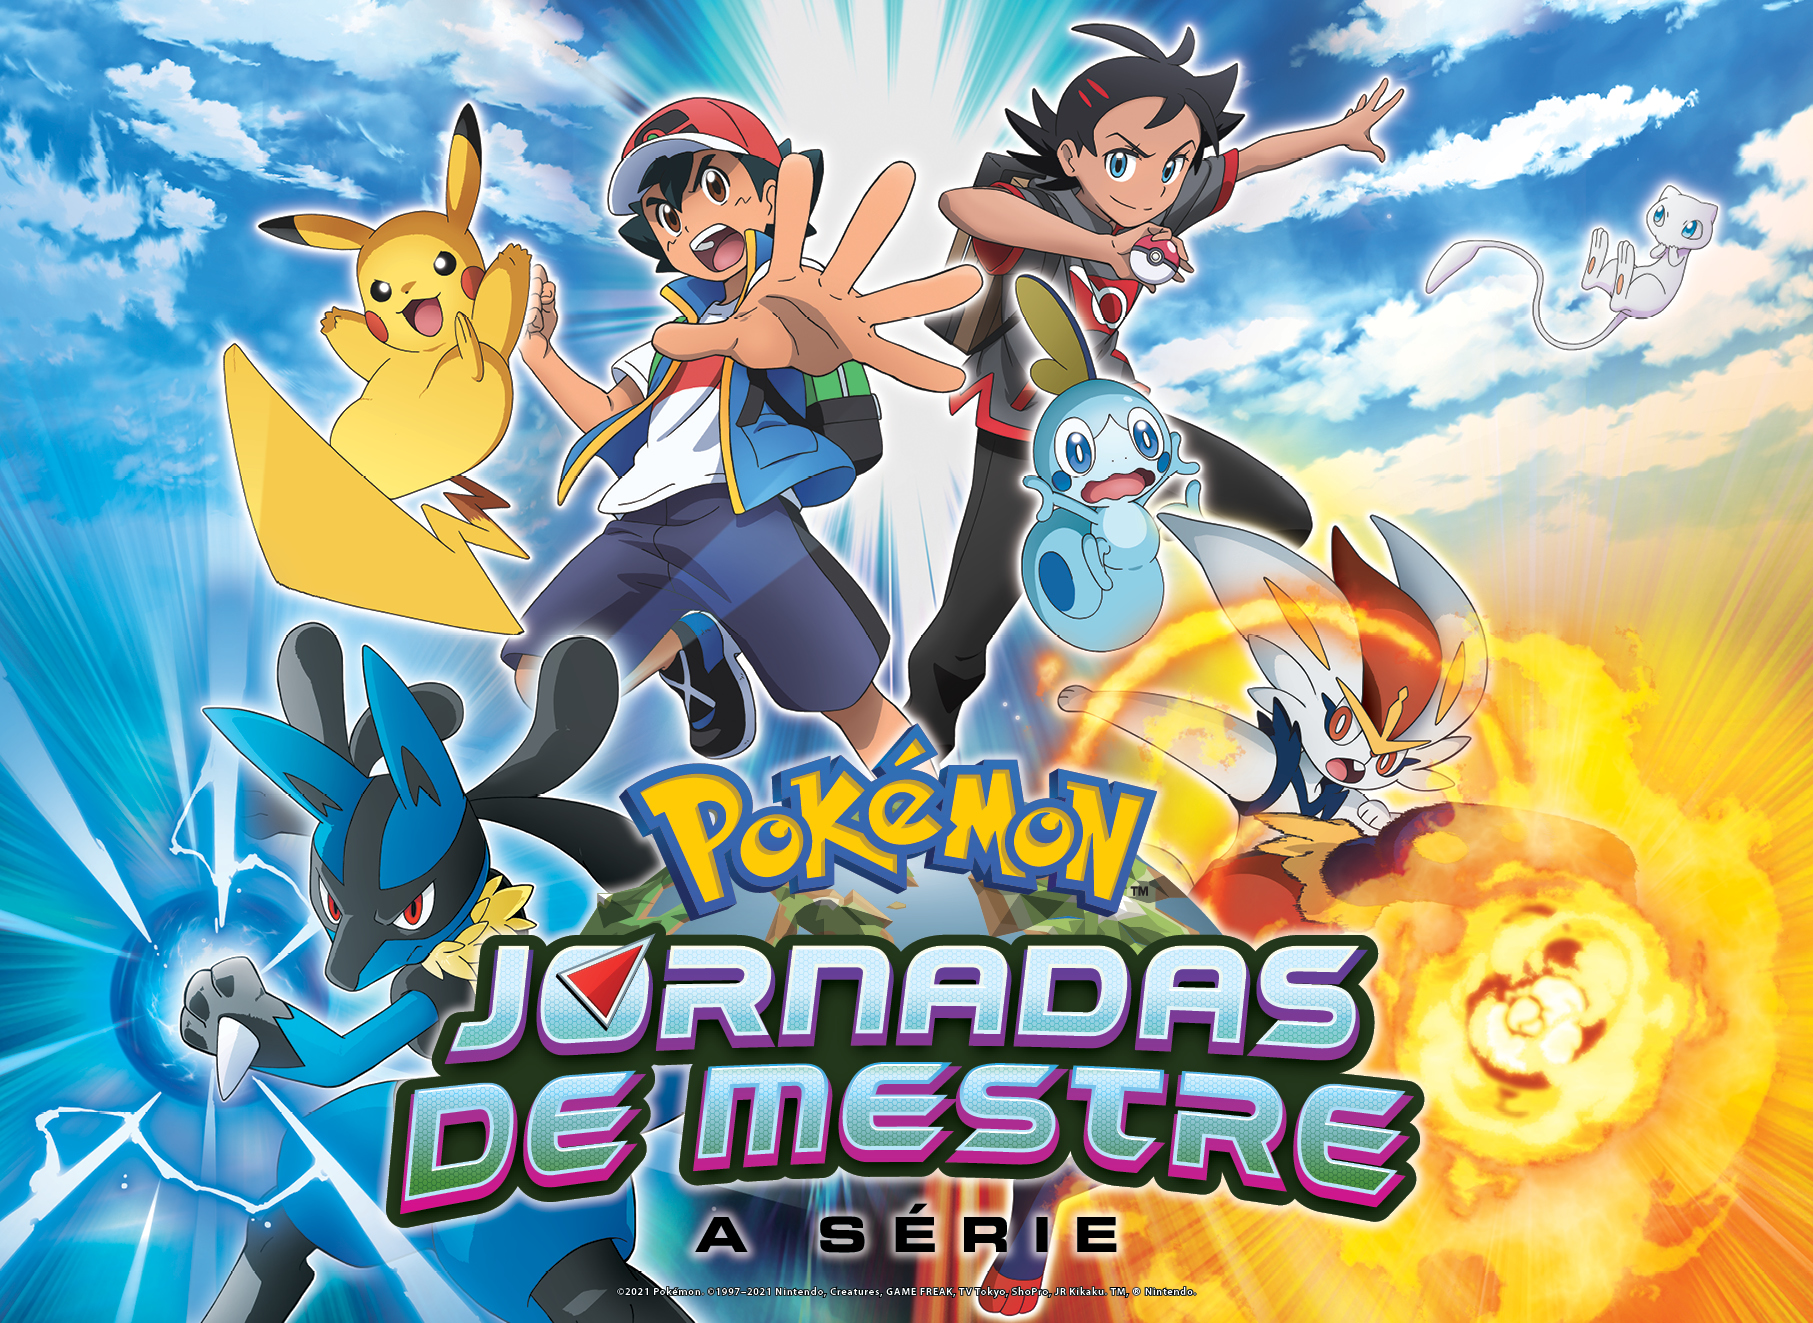 Jornadas de Mestre Pokémon Poster